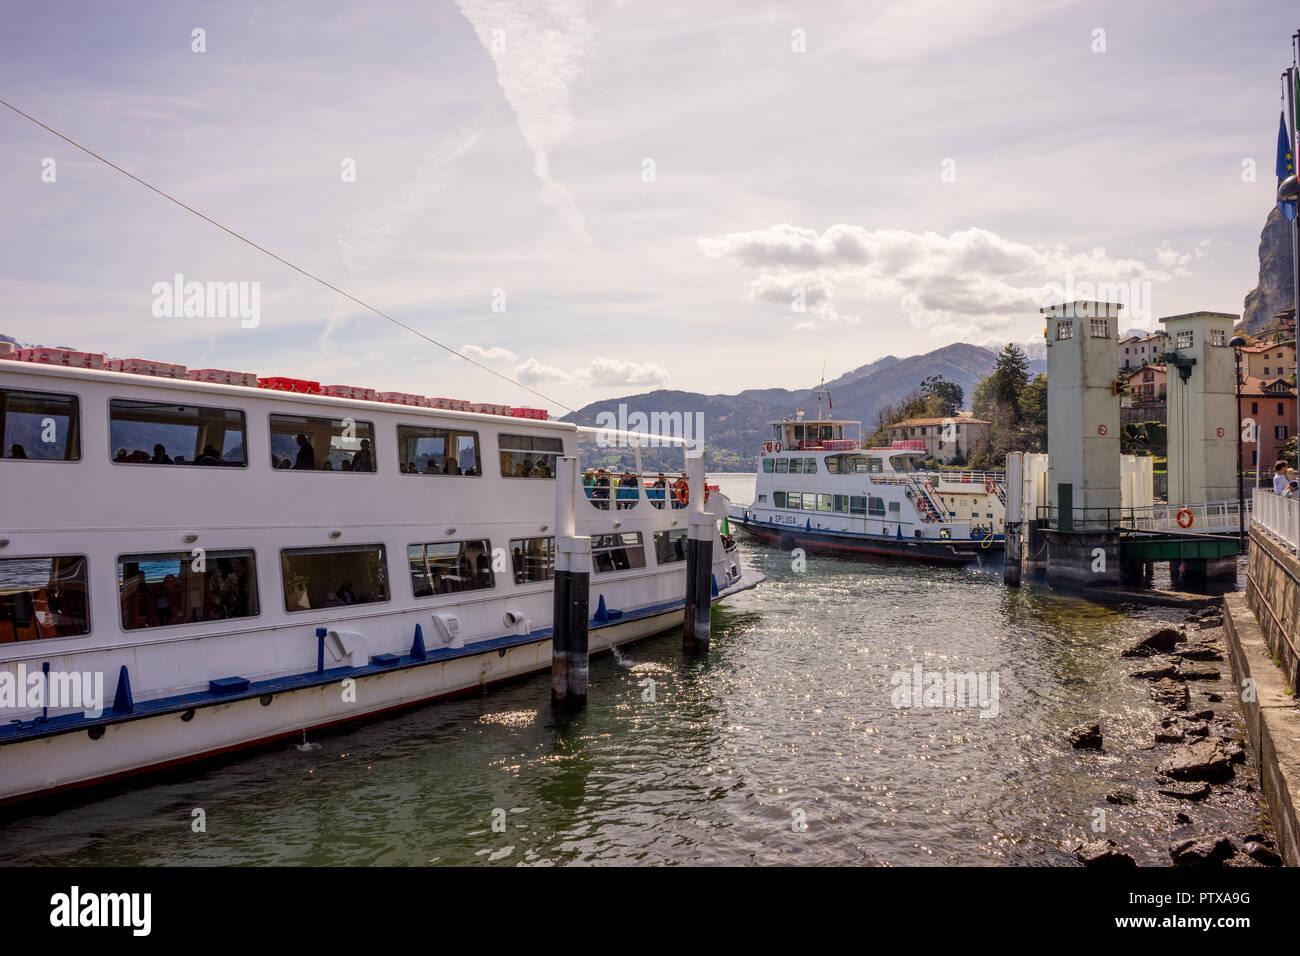 Menaggio, Italy-April 2, 2018: traffic jam with ferry boat